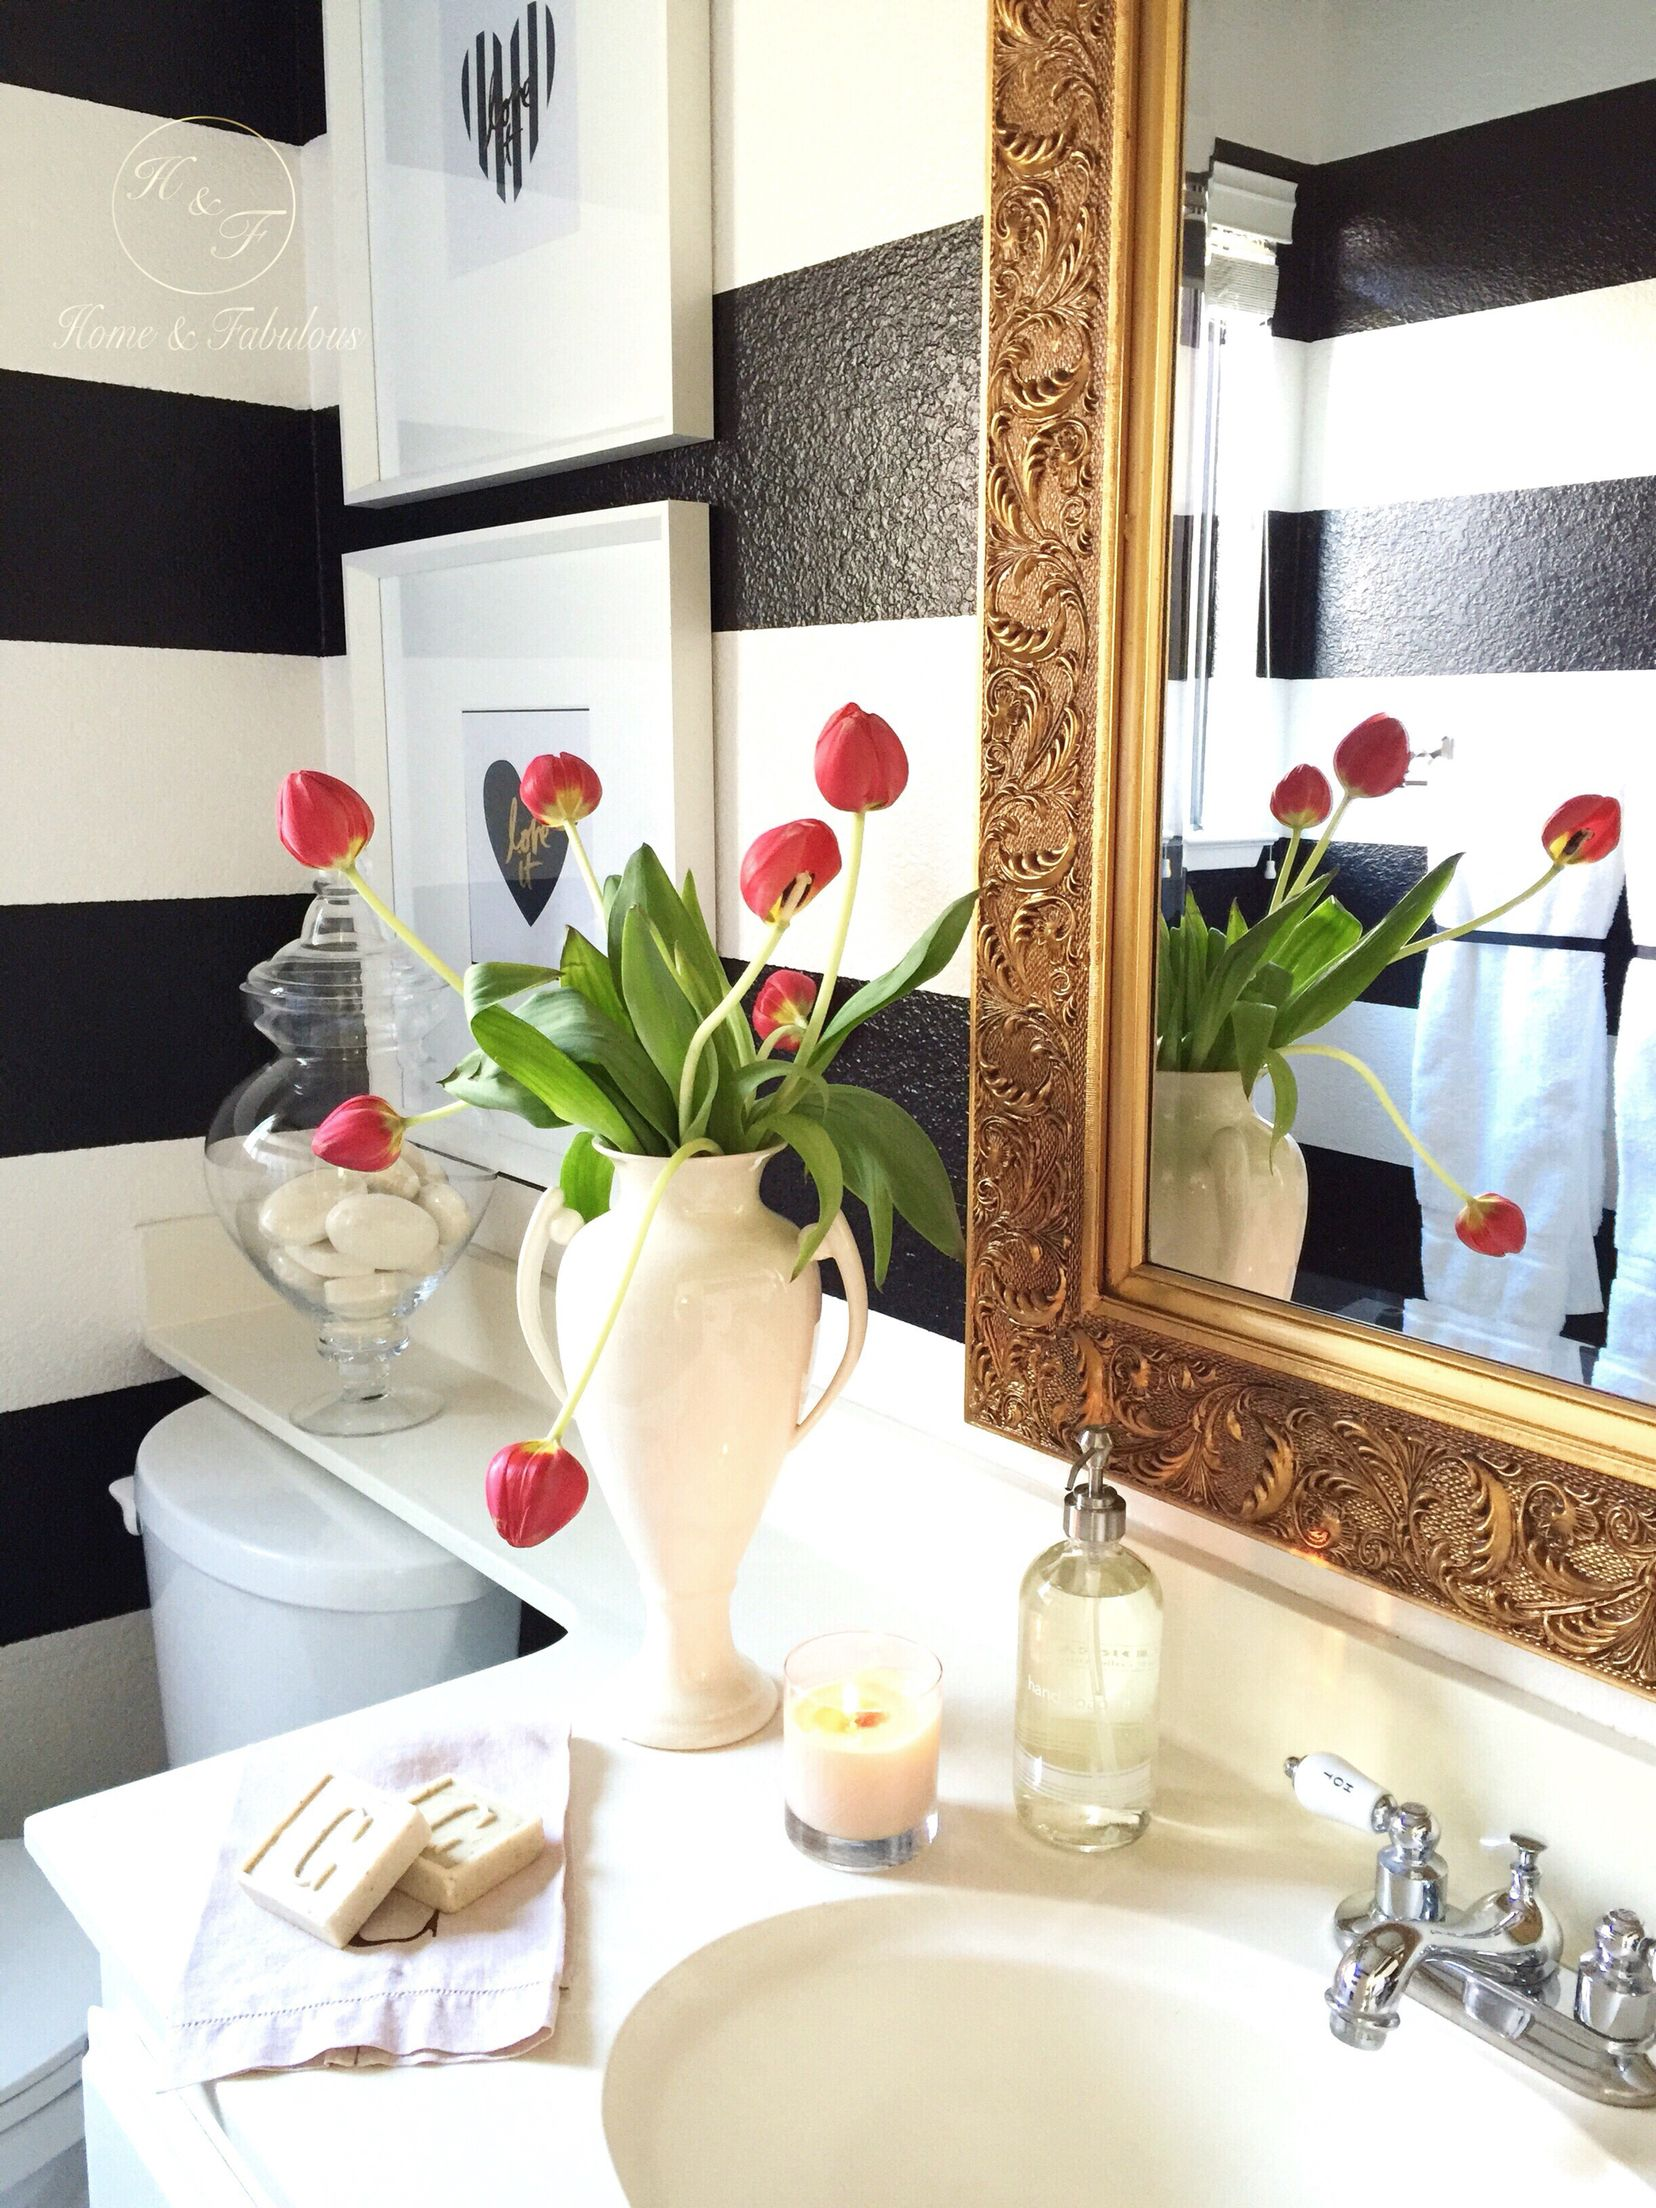 Home Goods Decor, Amazing Bathrooms, Decor